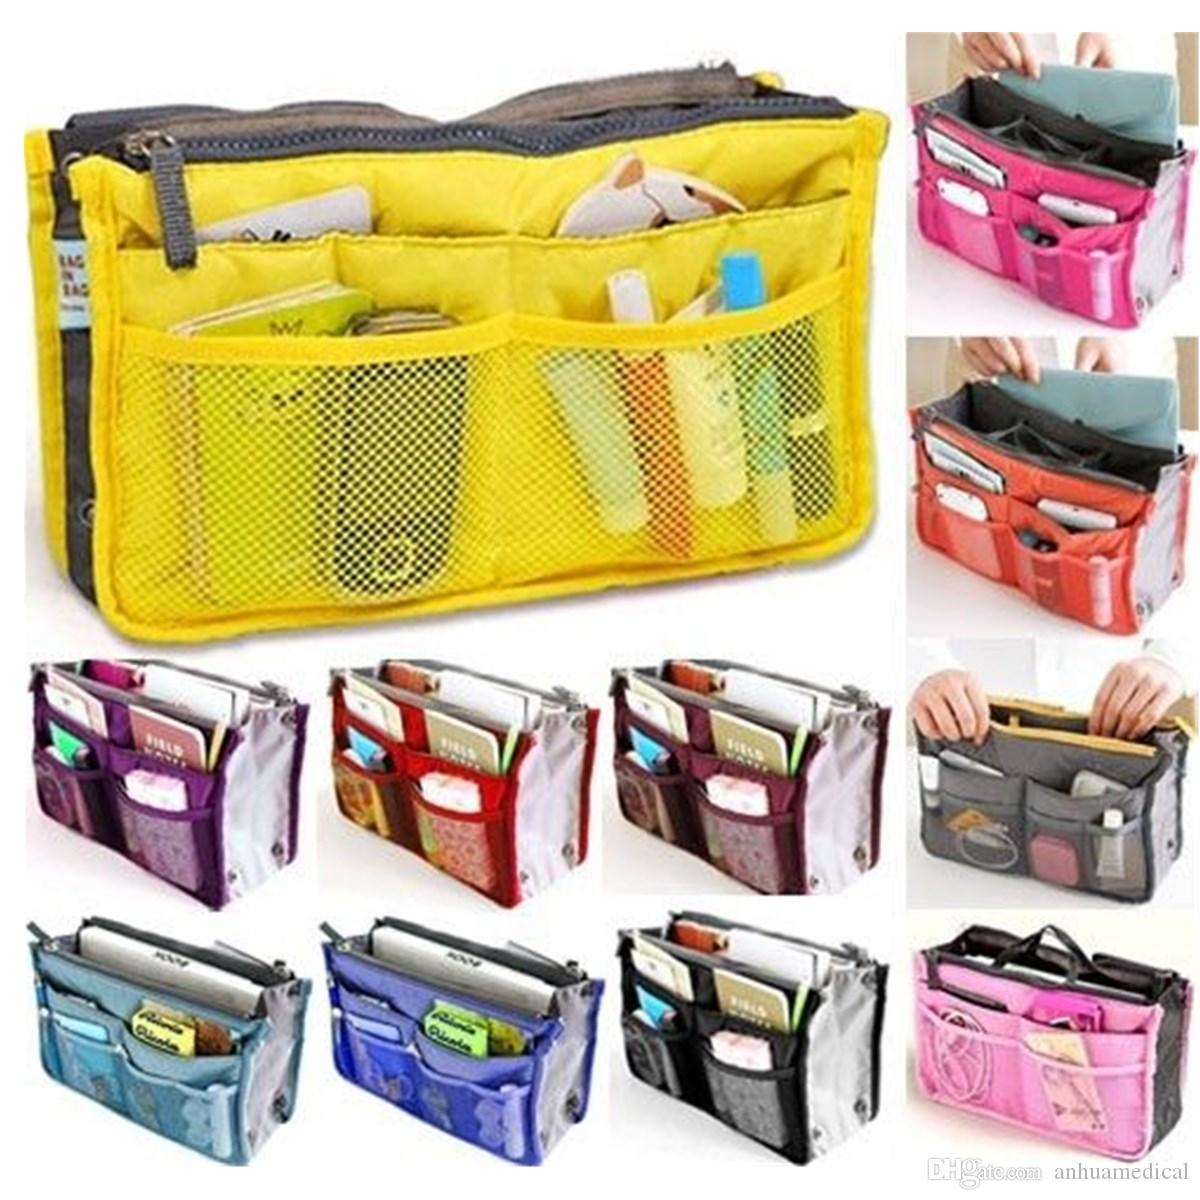 Purse Organizer Insert Multi Function Cosmetic Storage Bag In Bag New Purse  Organizer Insert Multi Function Cosmetic Storage Bag In Bag Fiorelli  Handbags ...